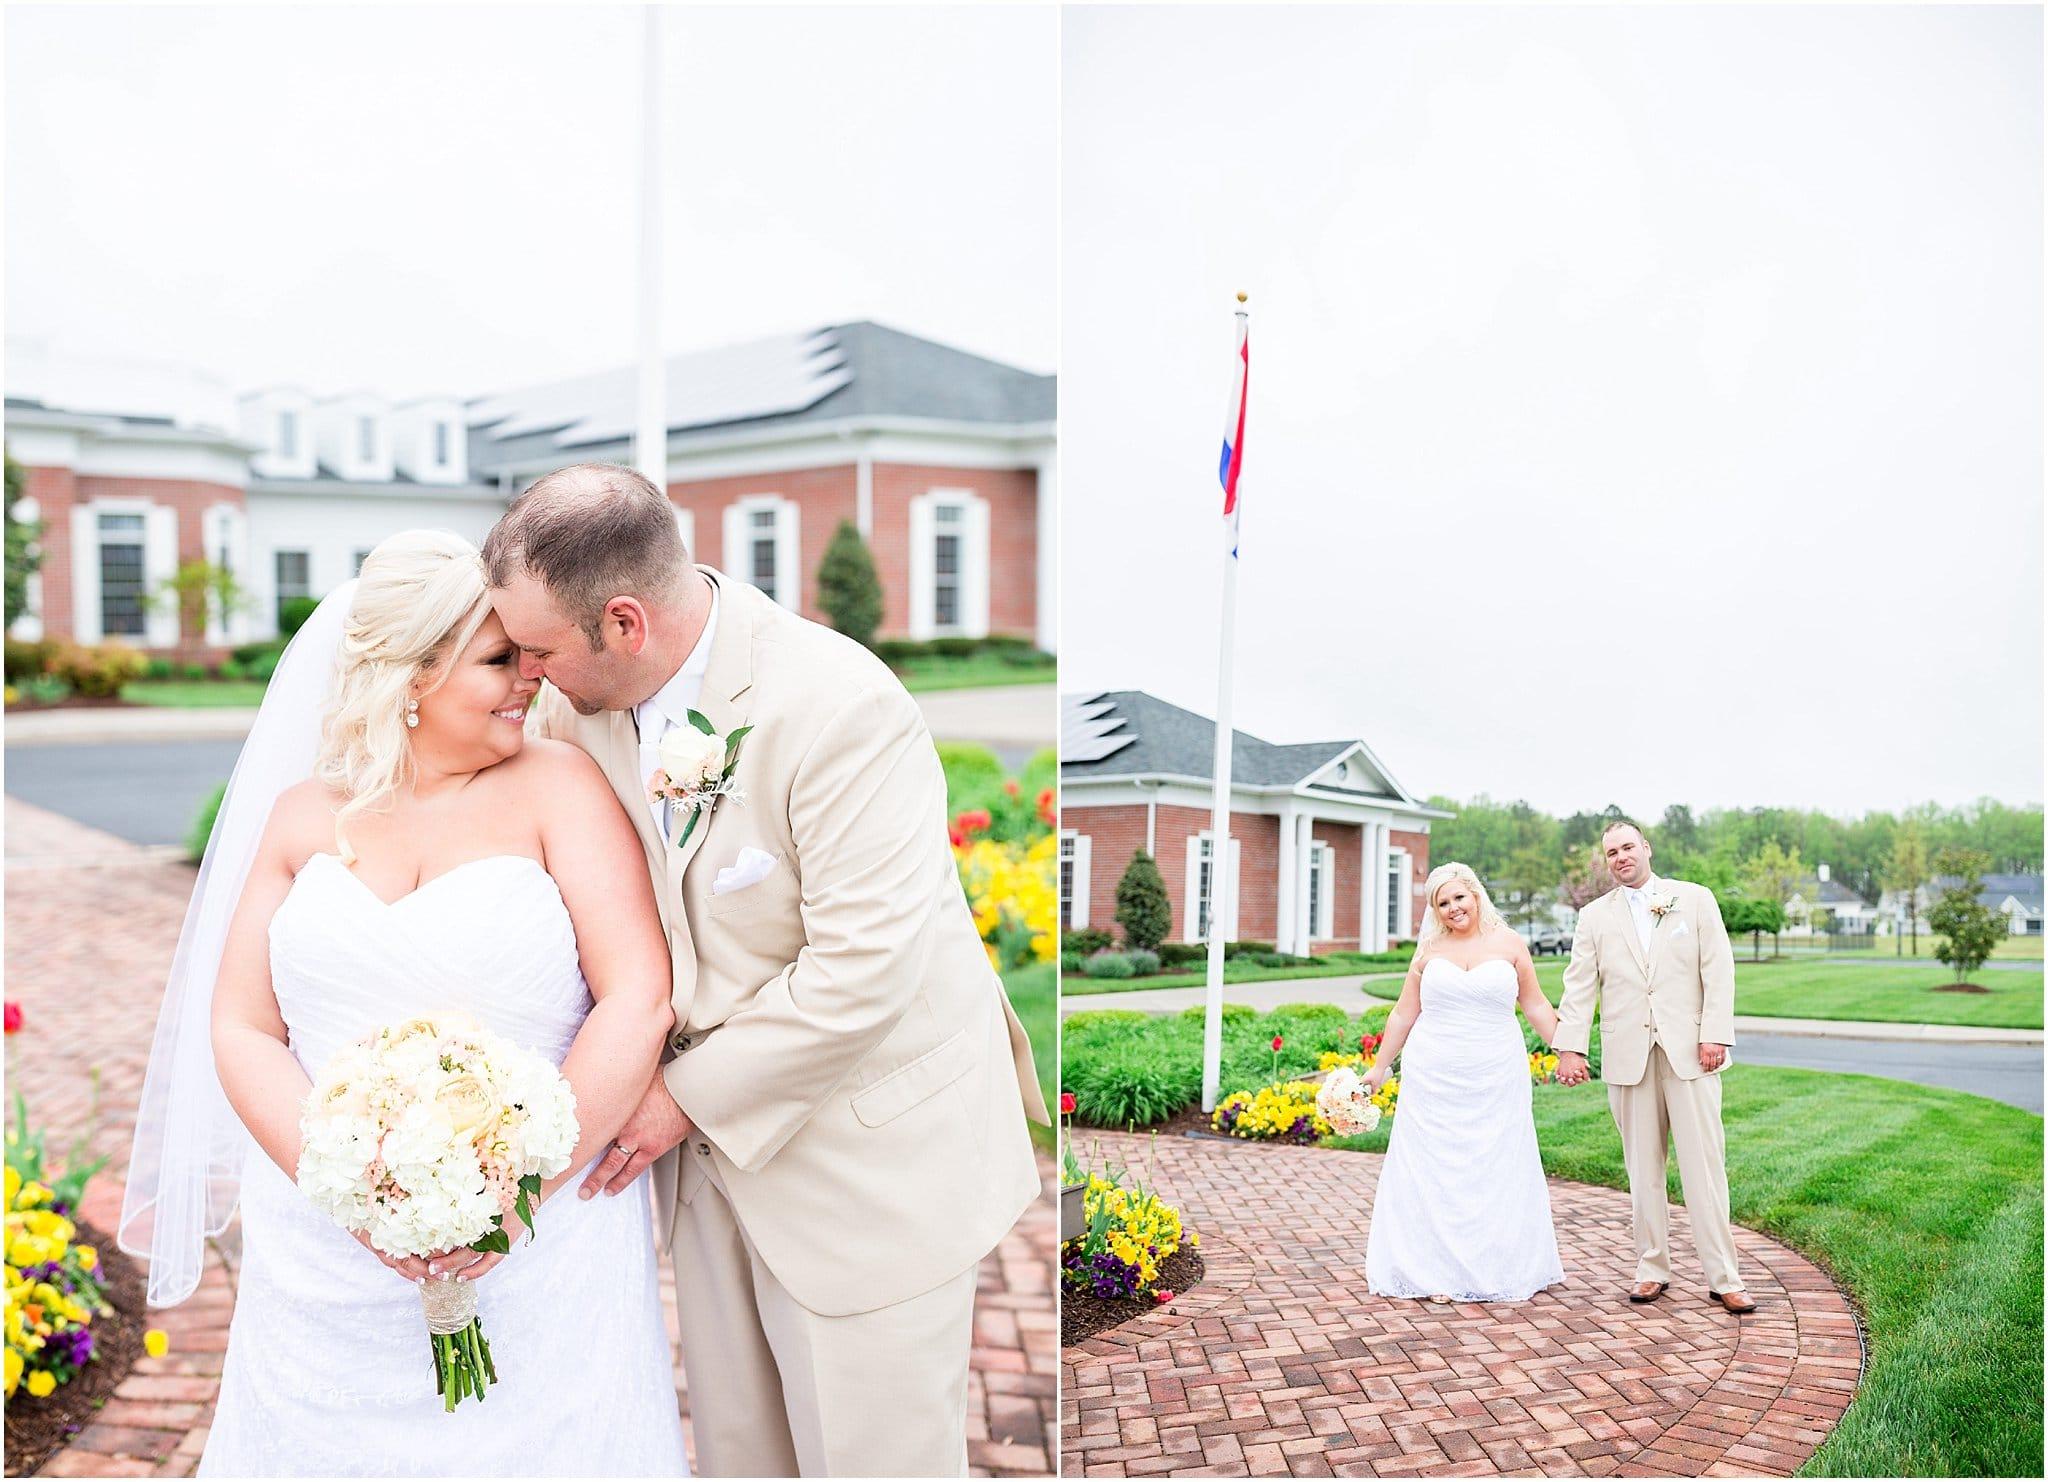 jessscott-milsboro-delaware-wedding-cassidymrphotography_0063